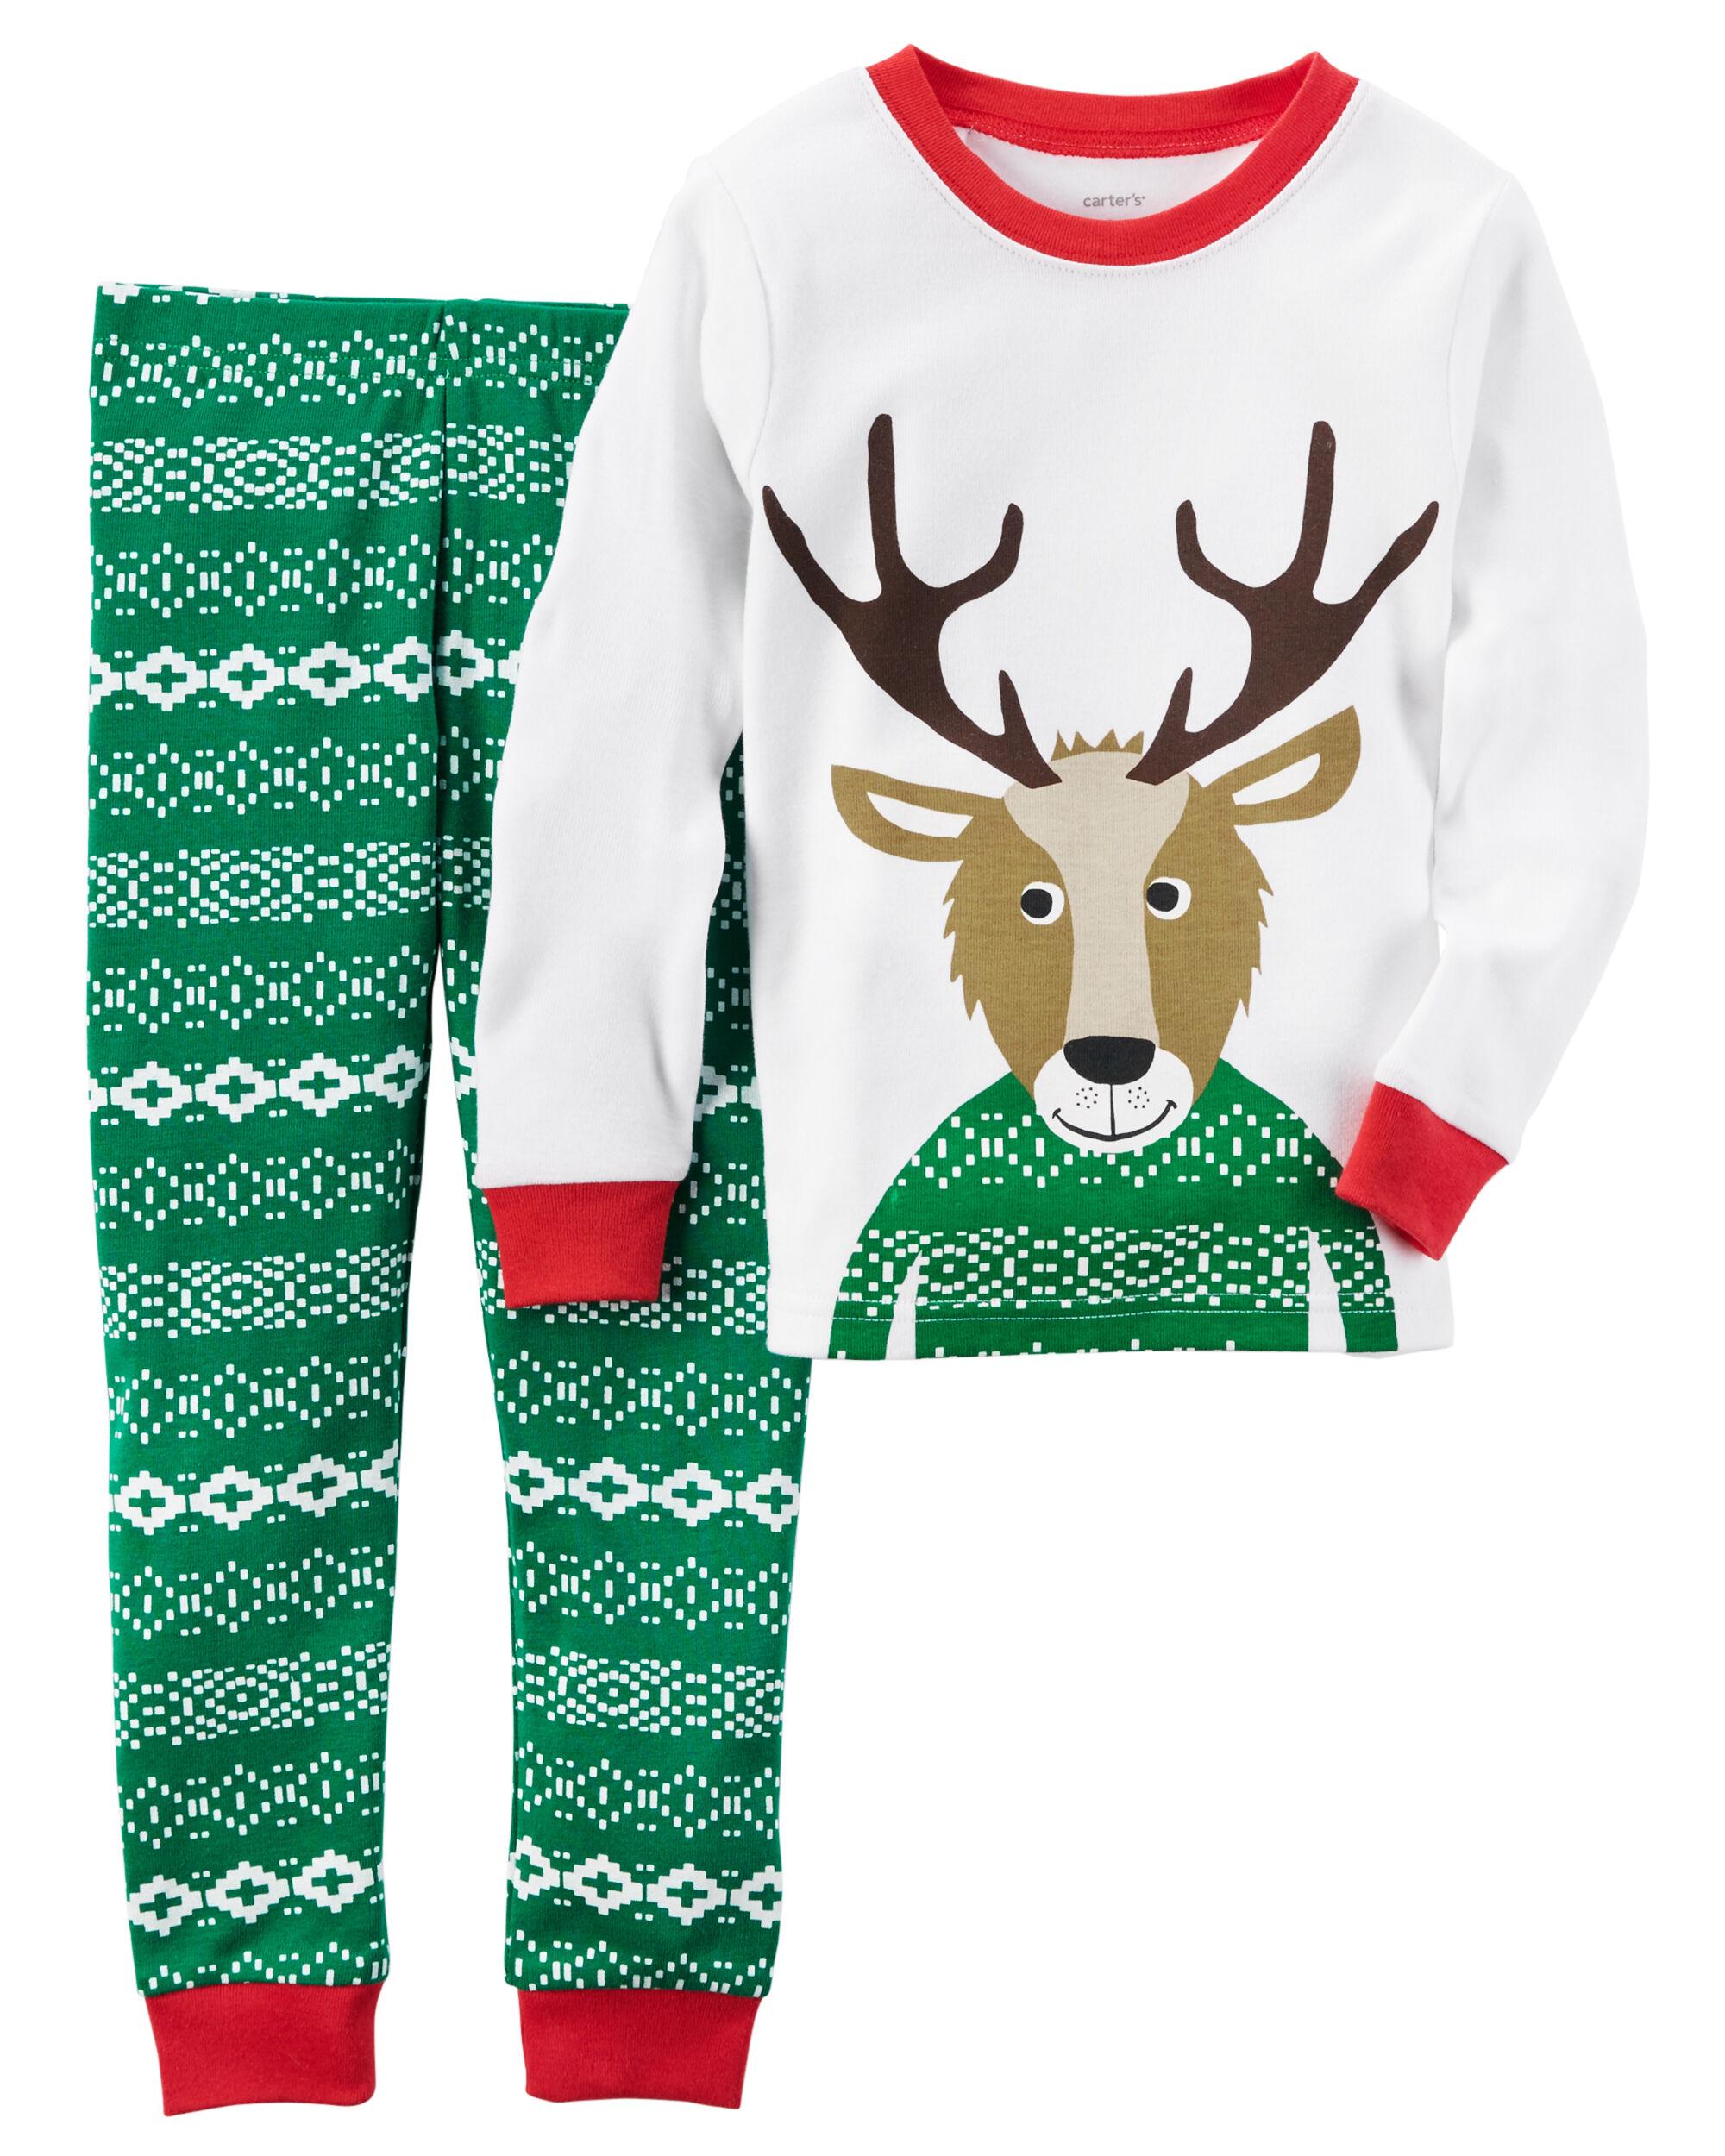 2-Piece Snug Fit Cotton Christmas PJs   Carters.com